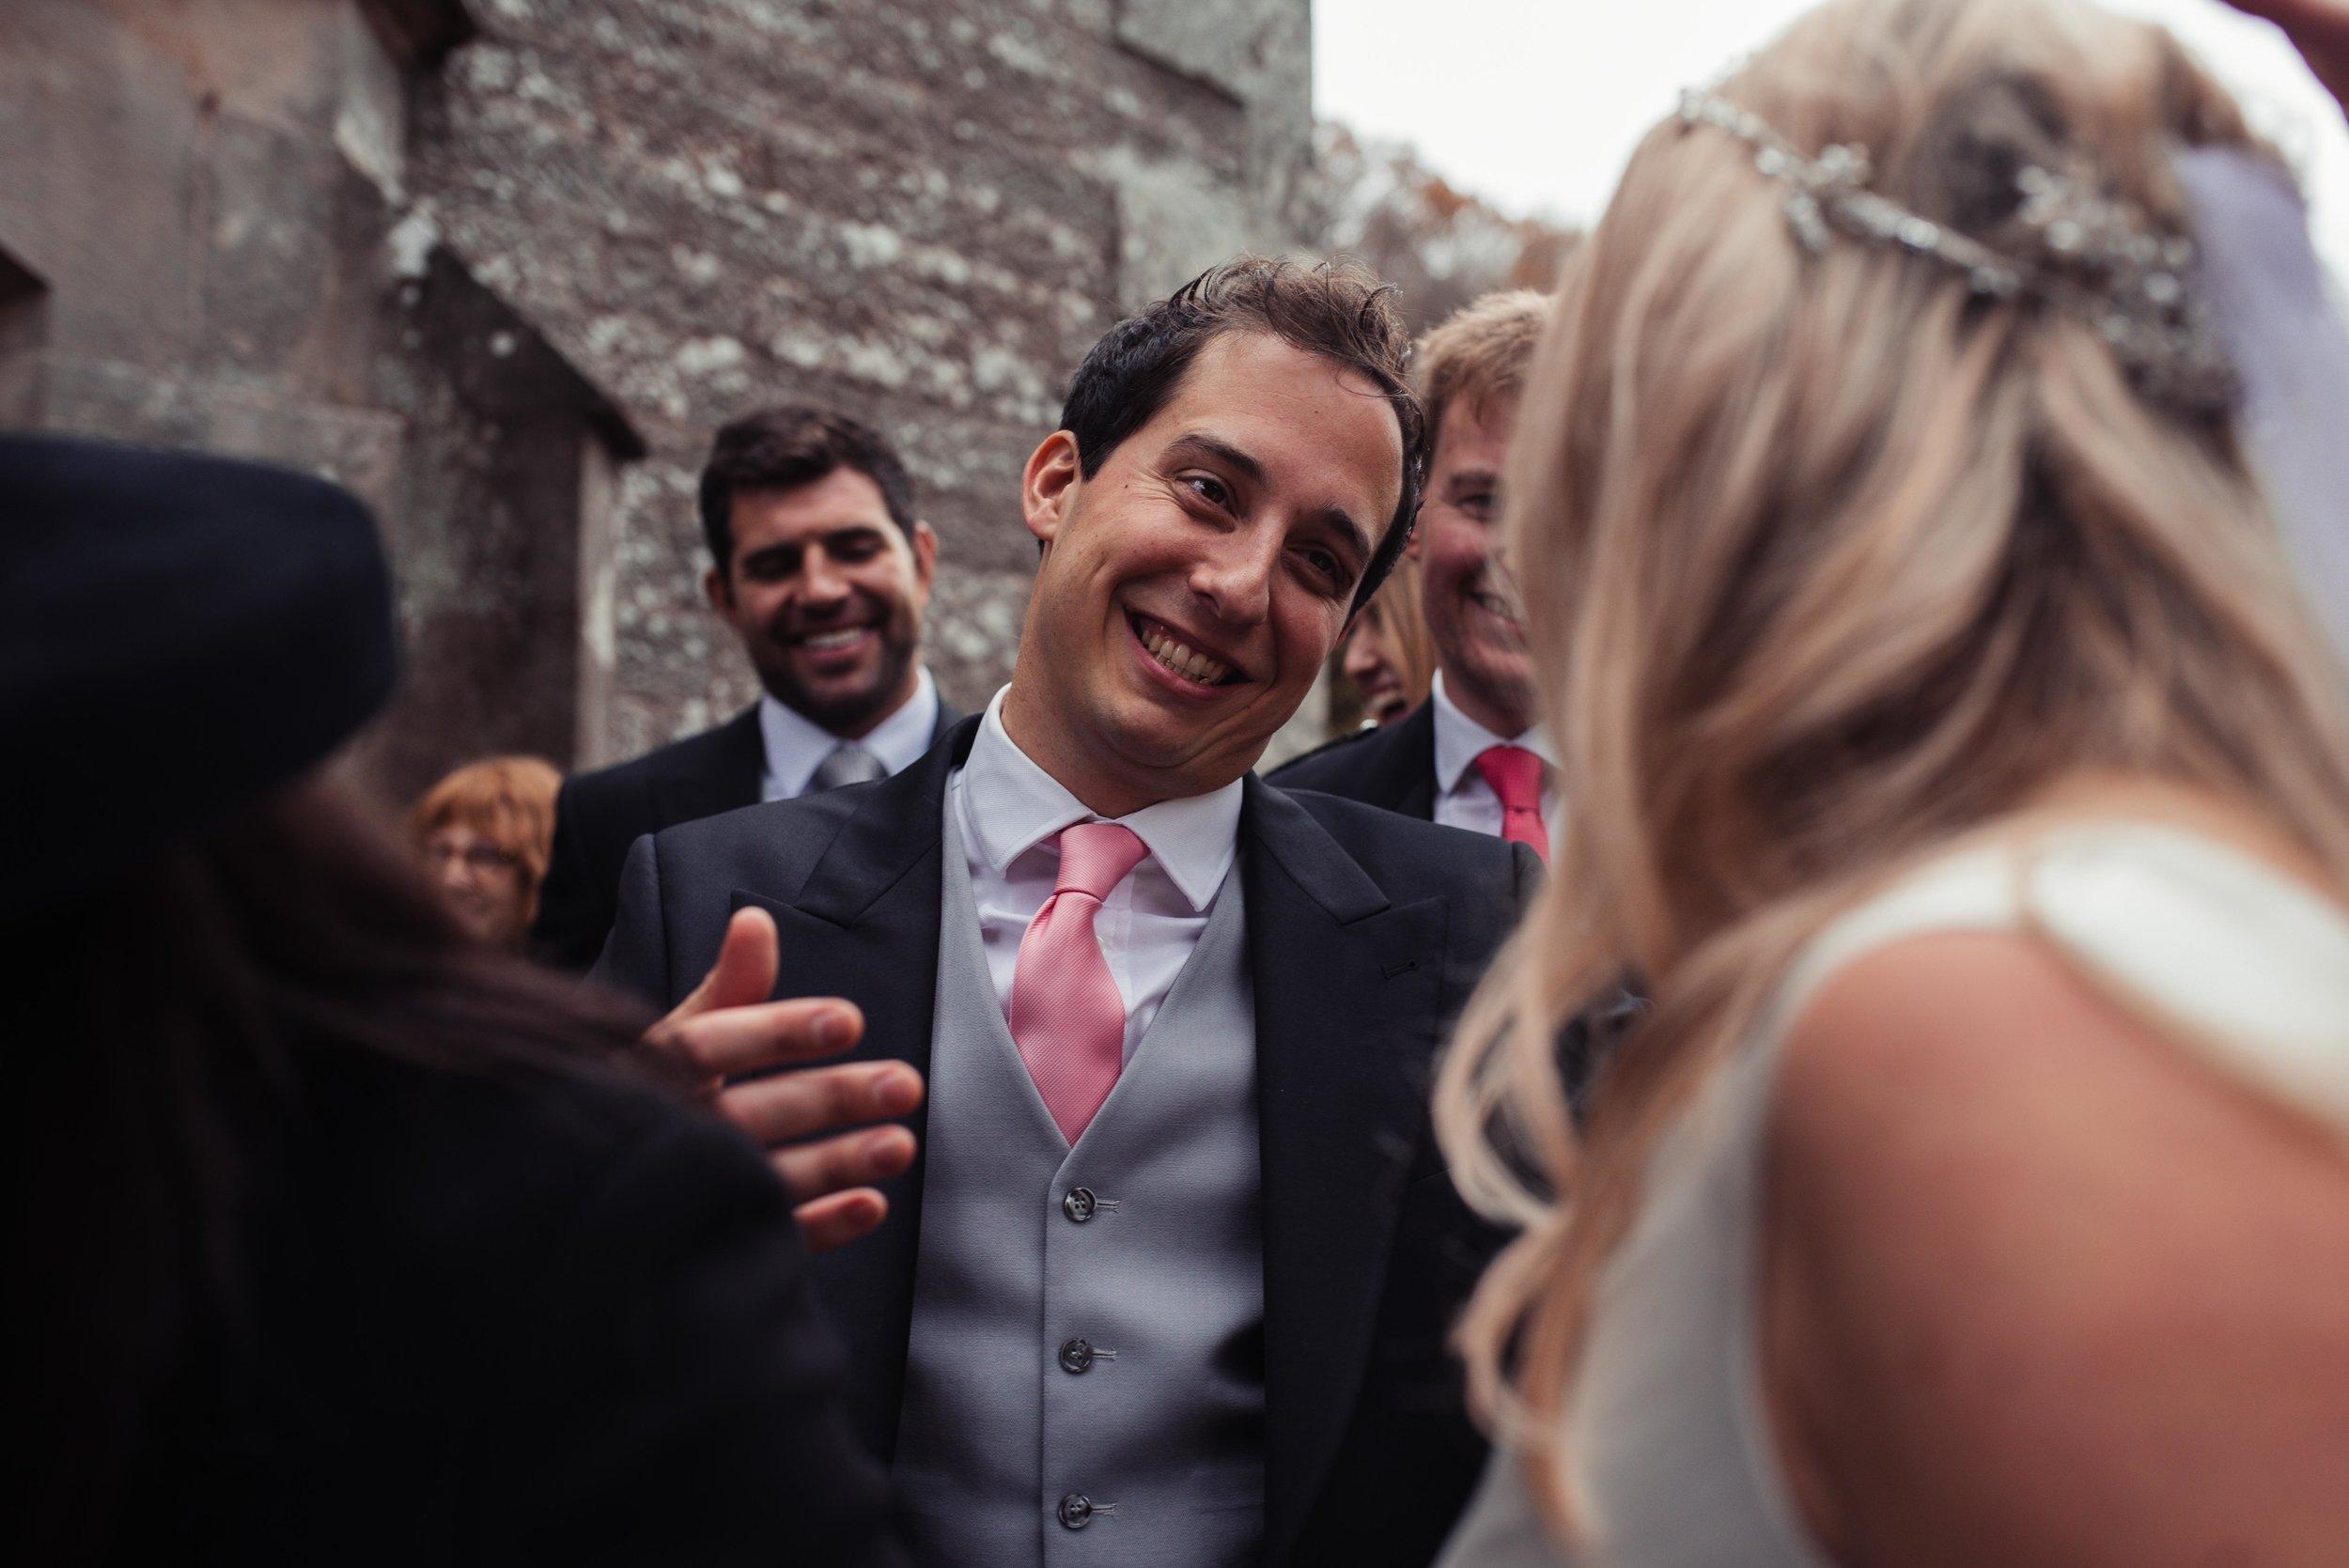 Askham-Hall-Wedding-Photography-36.jpg